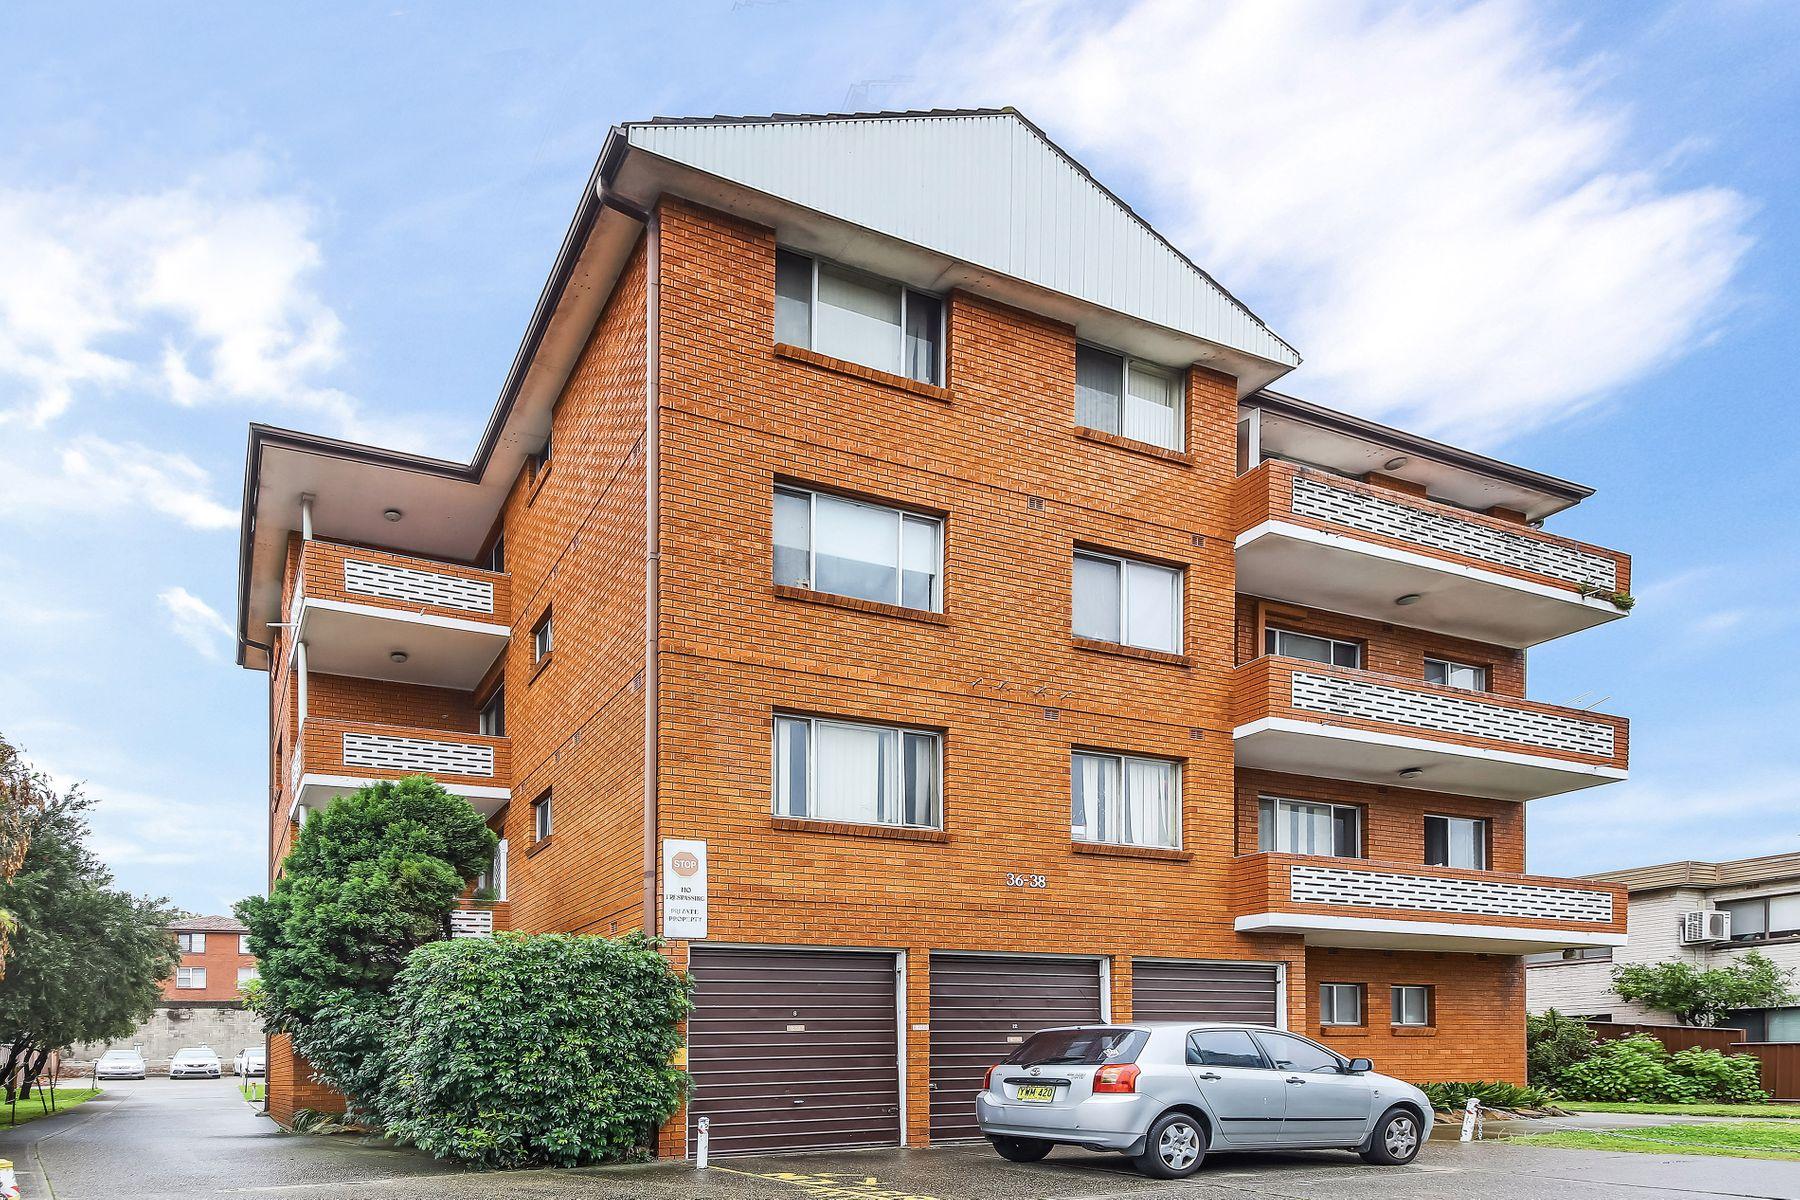 13/36-38 St Hilliers Road, Auburn, NSW 2144